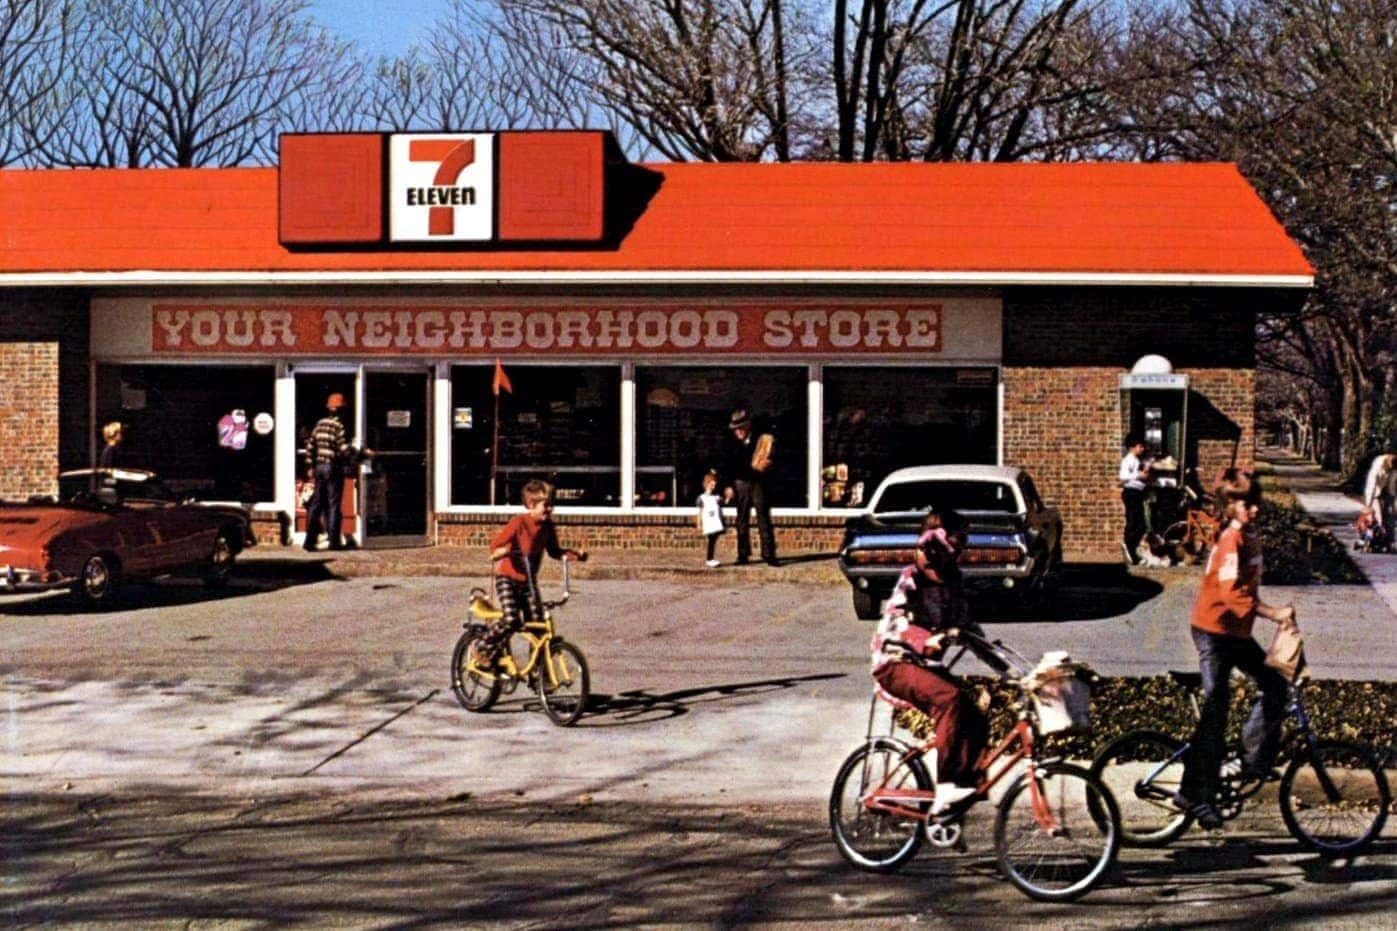 Vintage 7-Eleven stores